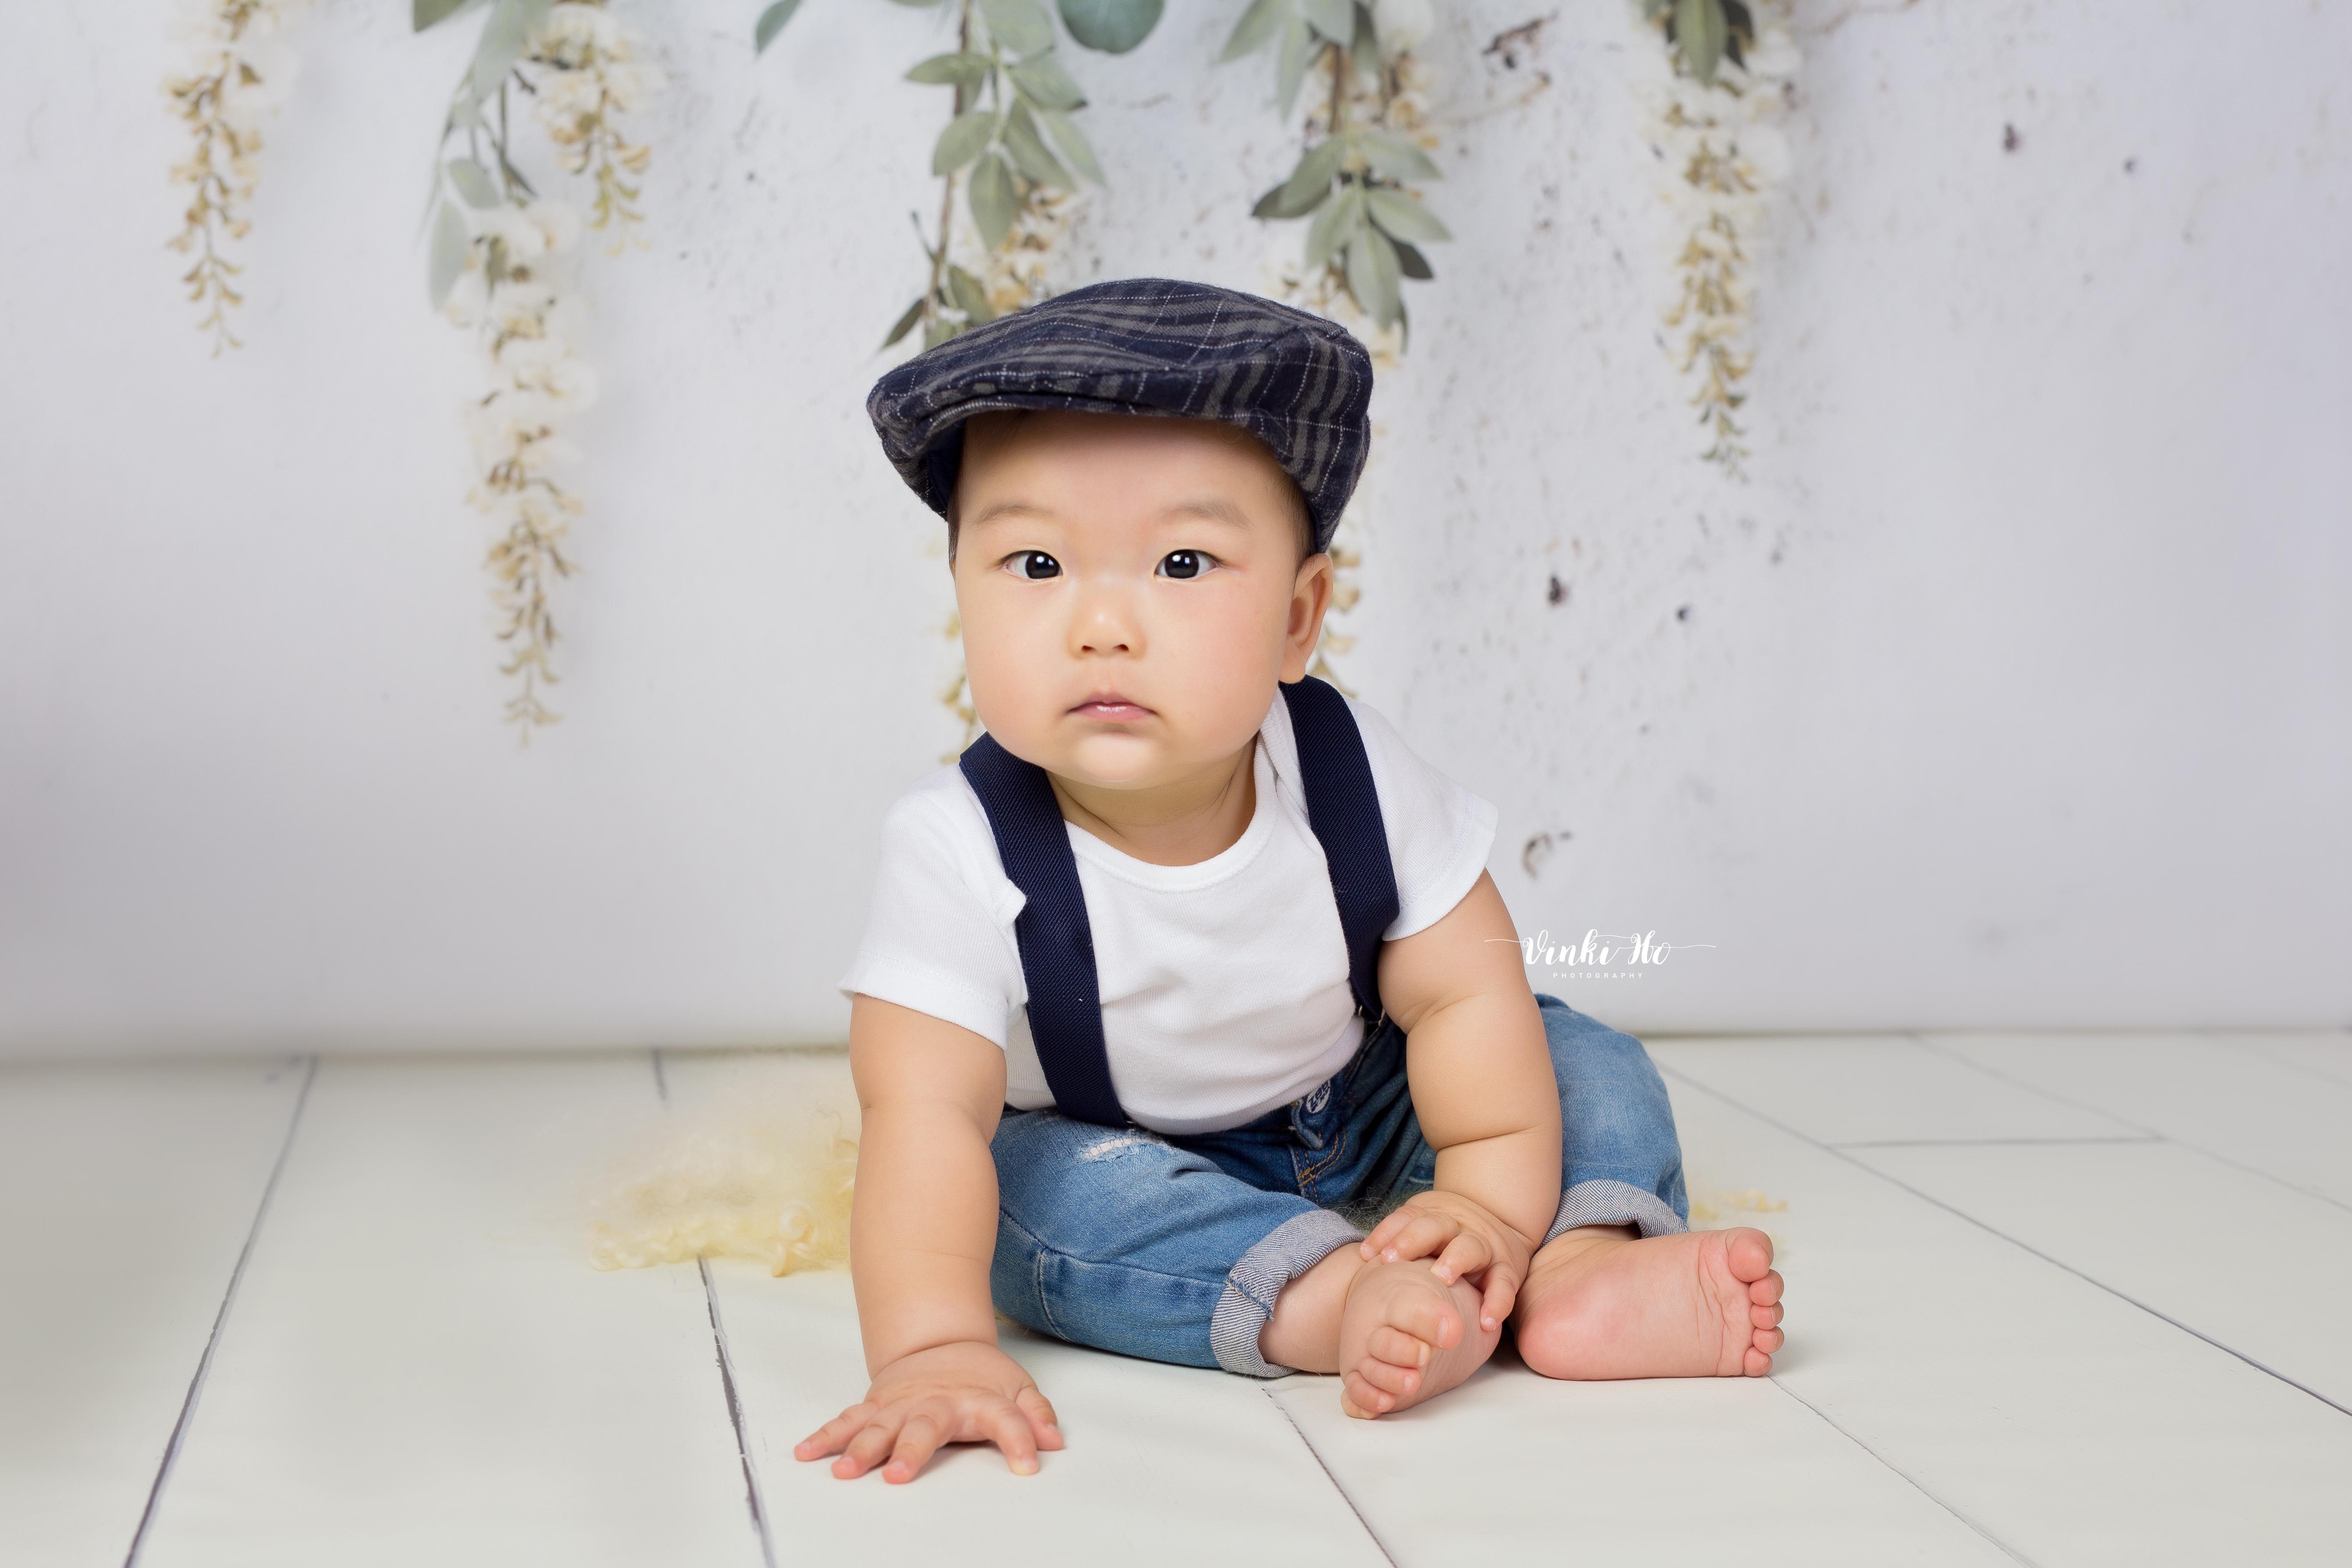 Studio_Baby Nathaniel 6mths old